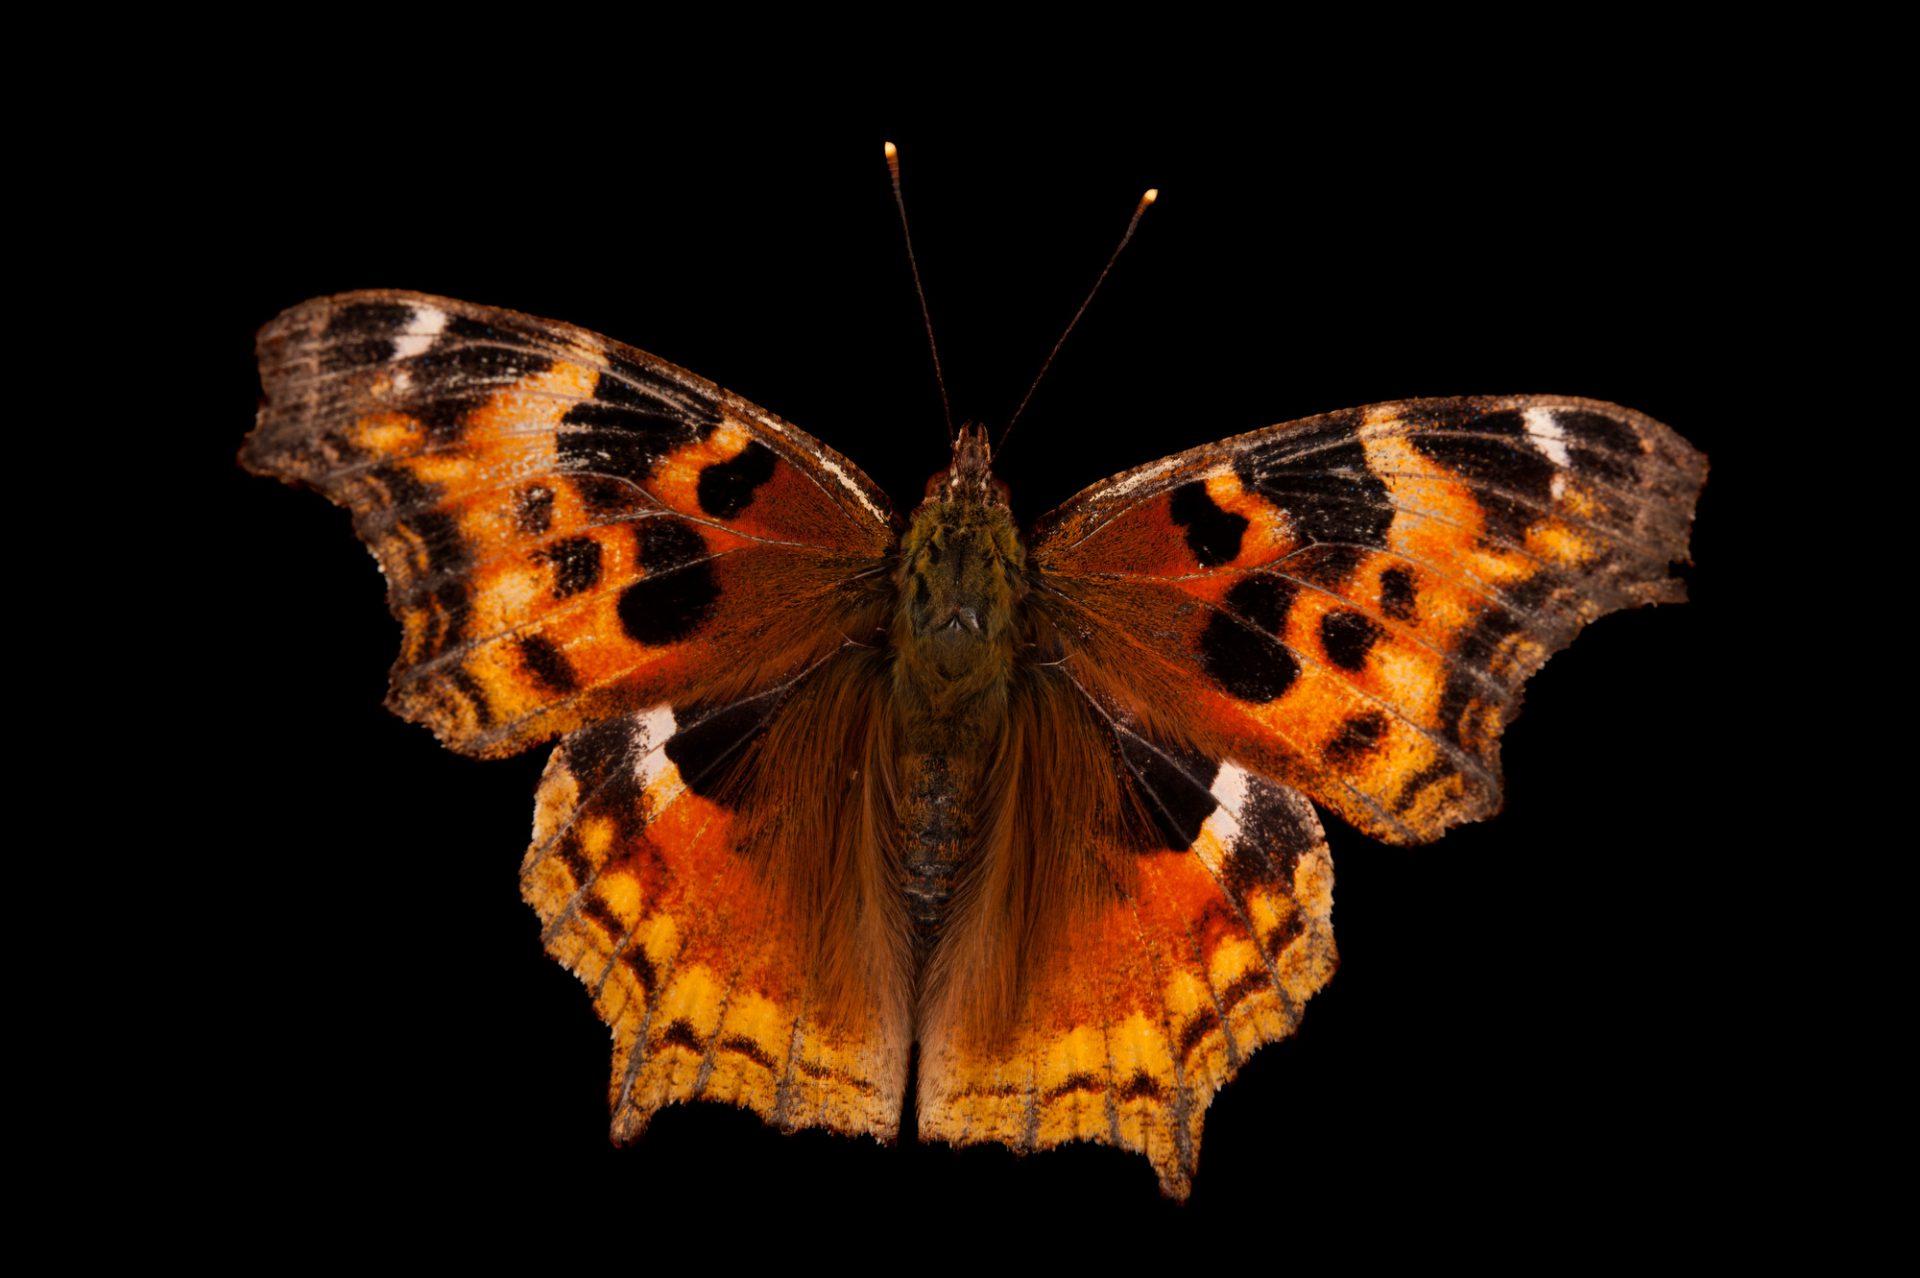 A compton tortoiseshell butterfly (Nymphalis vaualbum) from Cross Lake, Minnesota.